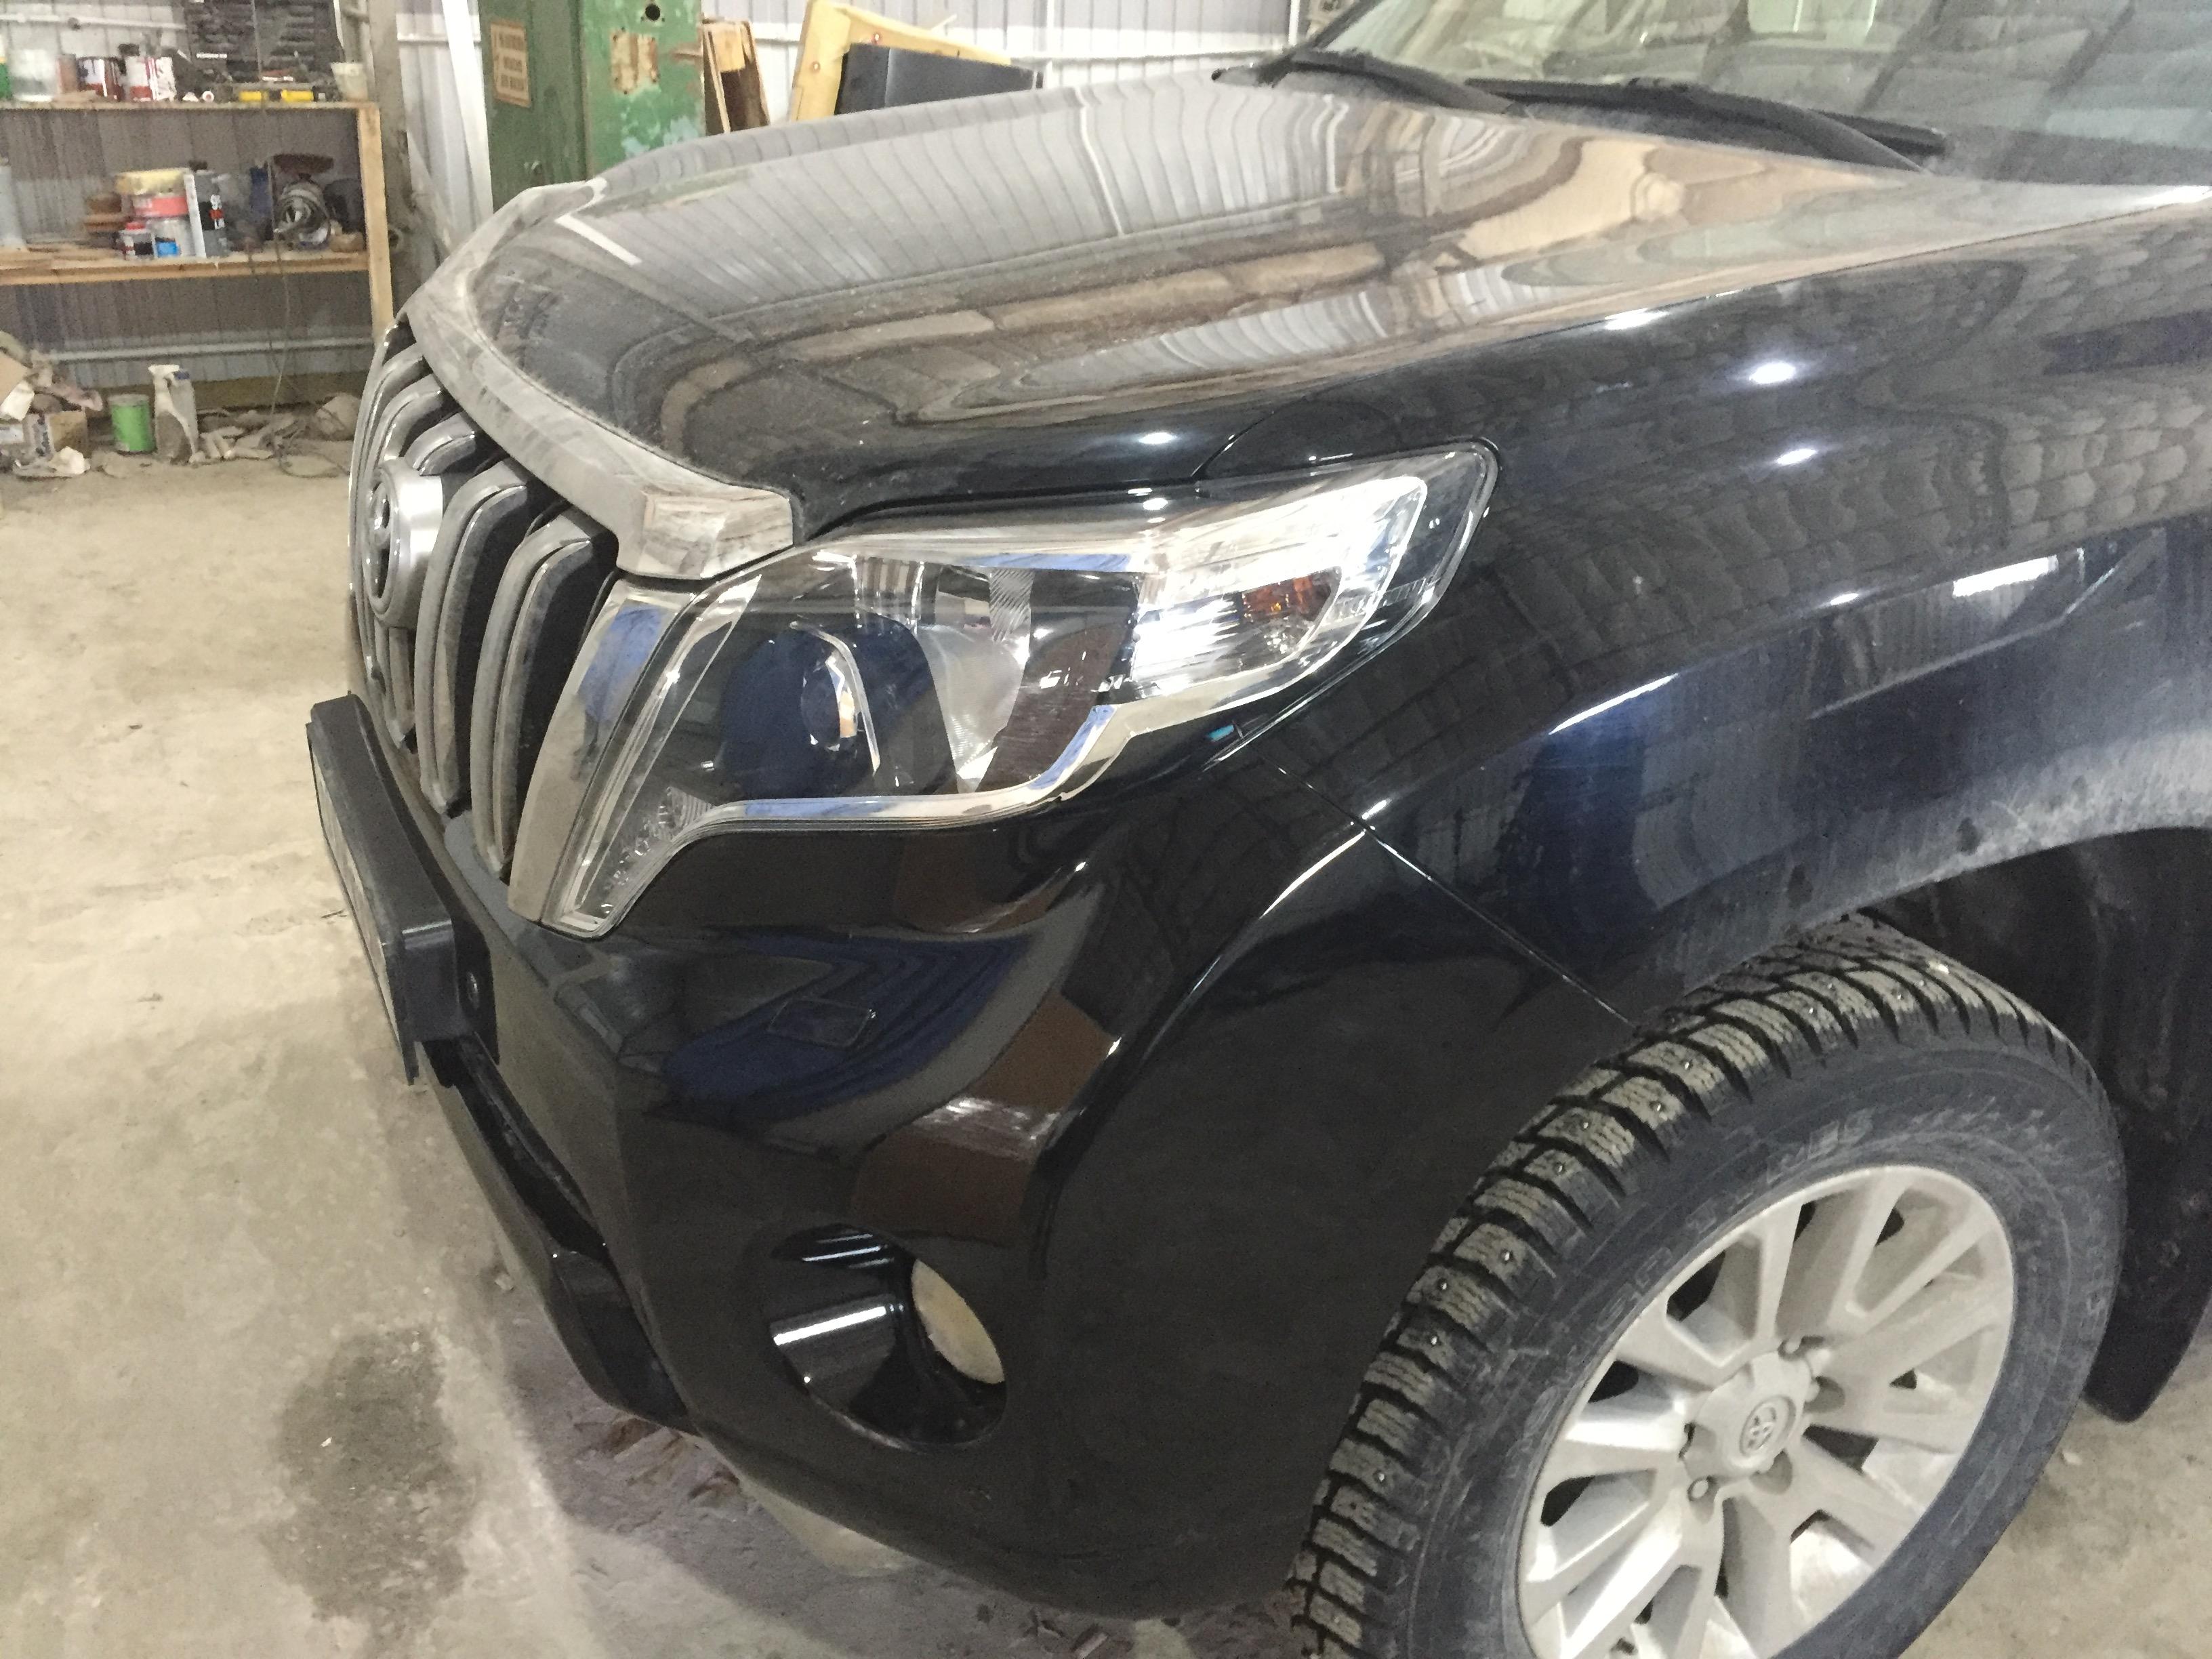 Тойота Лэнд Круизер 150/ Toyota LK150 ремонт переднего бампера и покраска - после